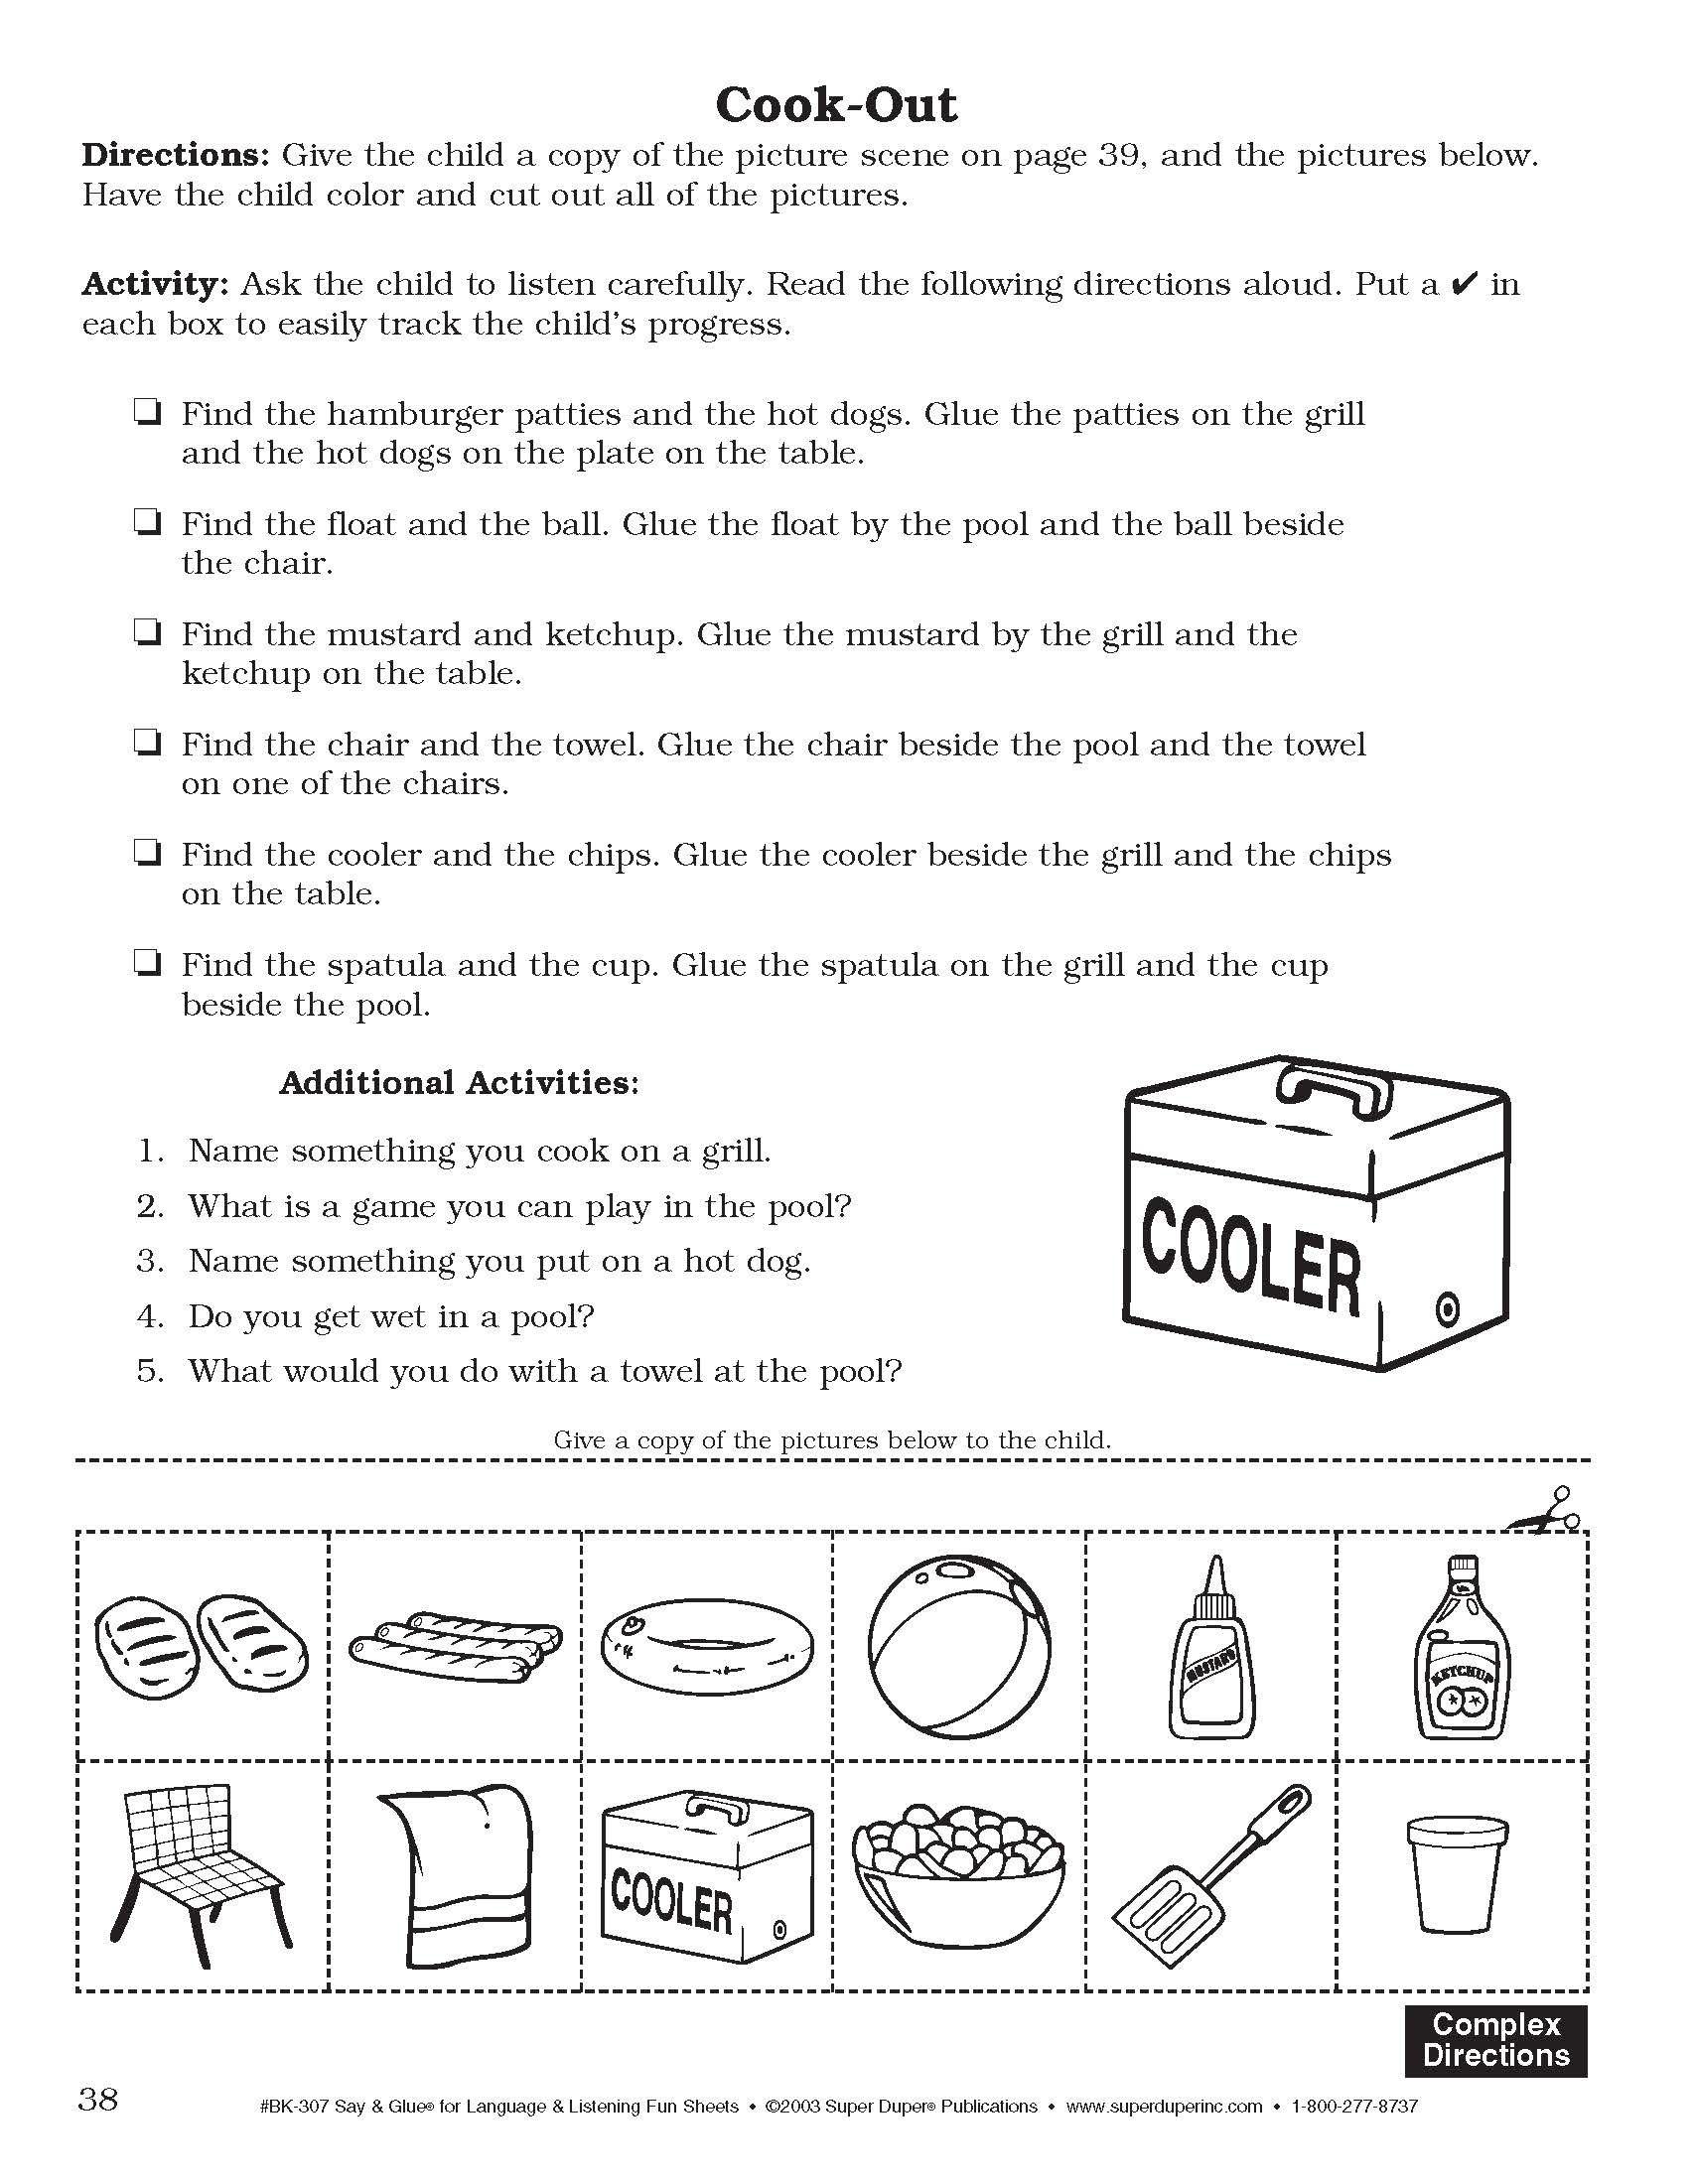 Complex Directions Fun Sheet